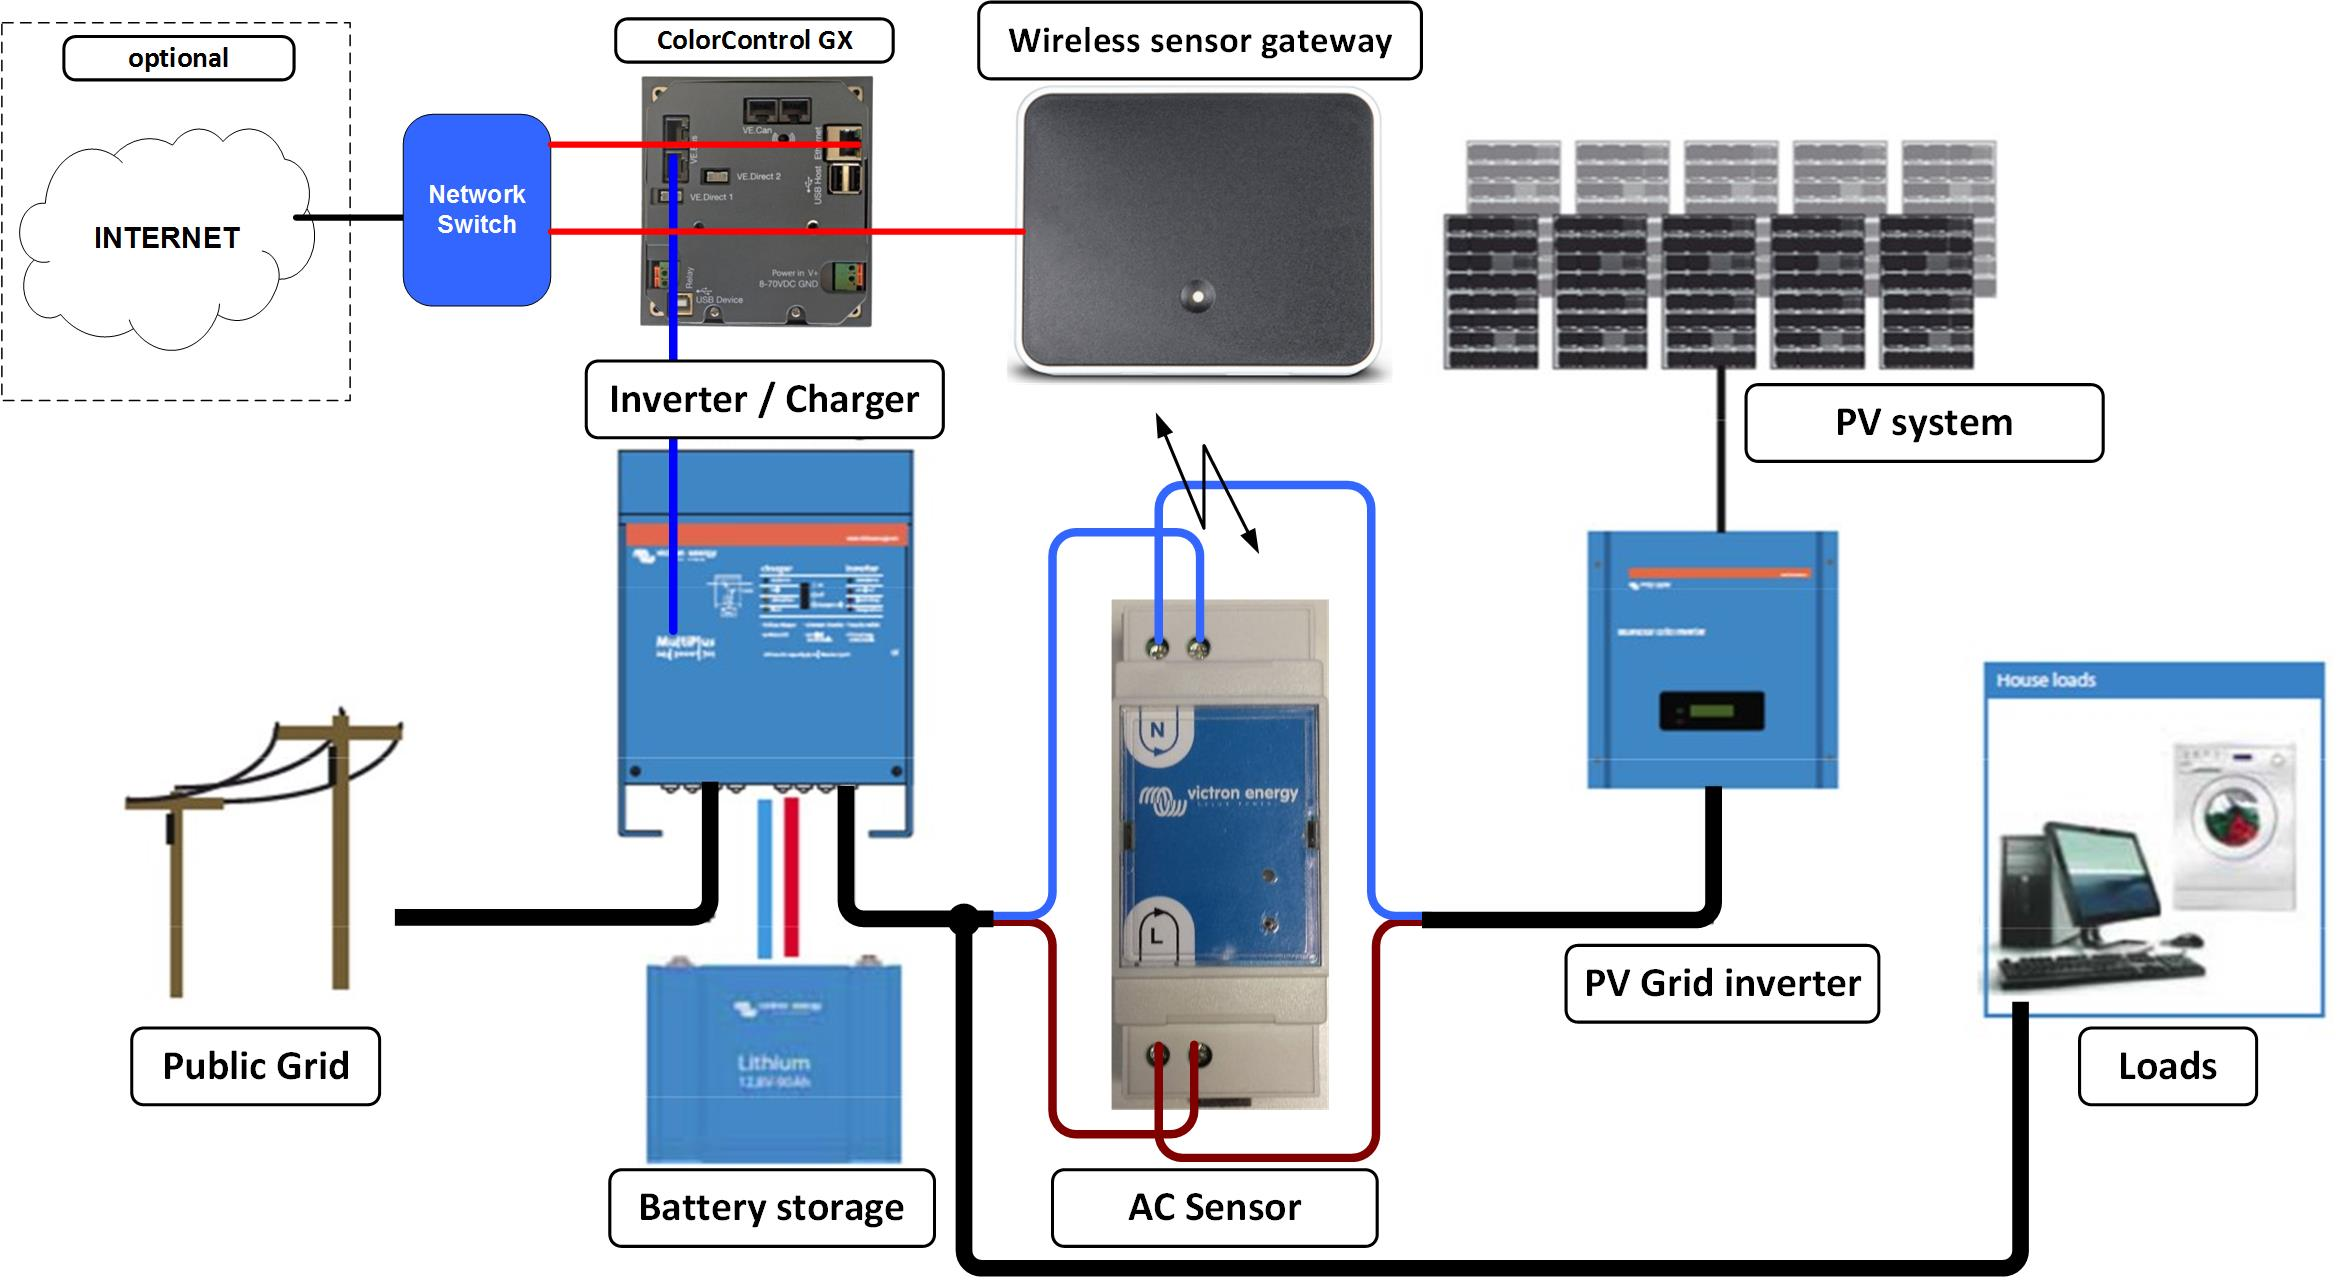 ccgx quby_gateway_schema?w=850&tok=8bbaf9 wireless ac sensor manual [victron energy] victron quattro wiring diagram at gsmx.co